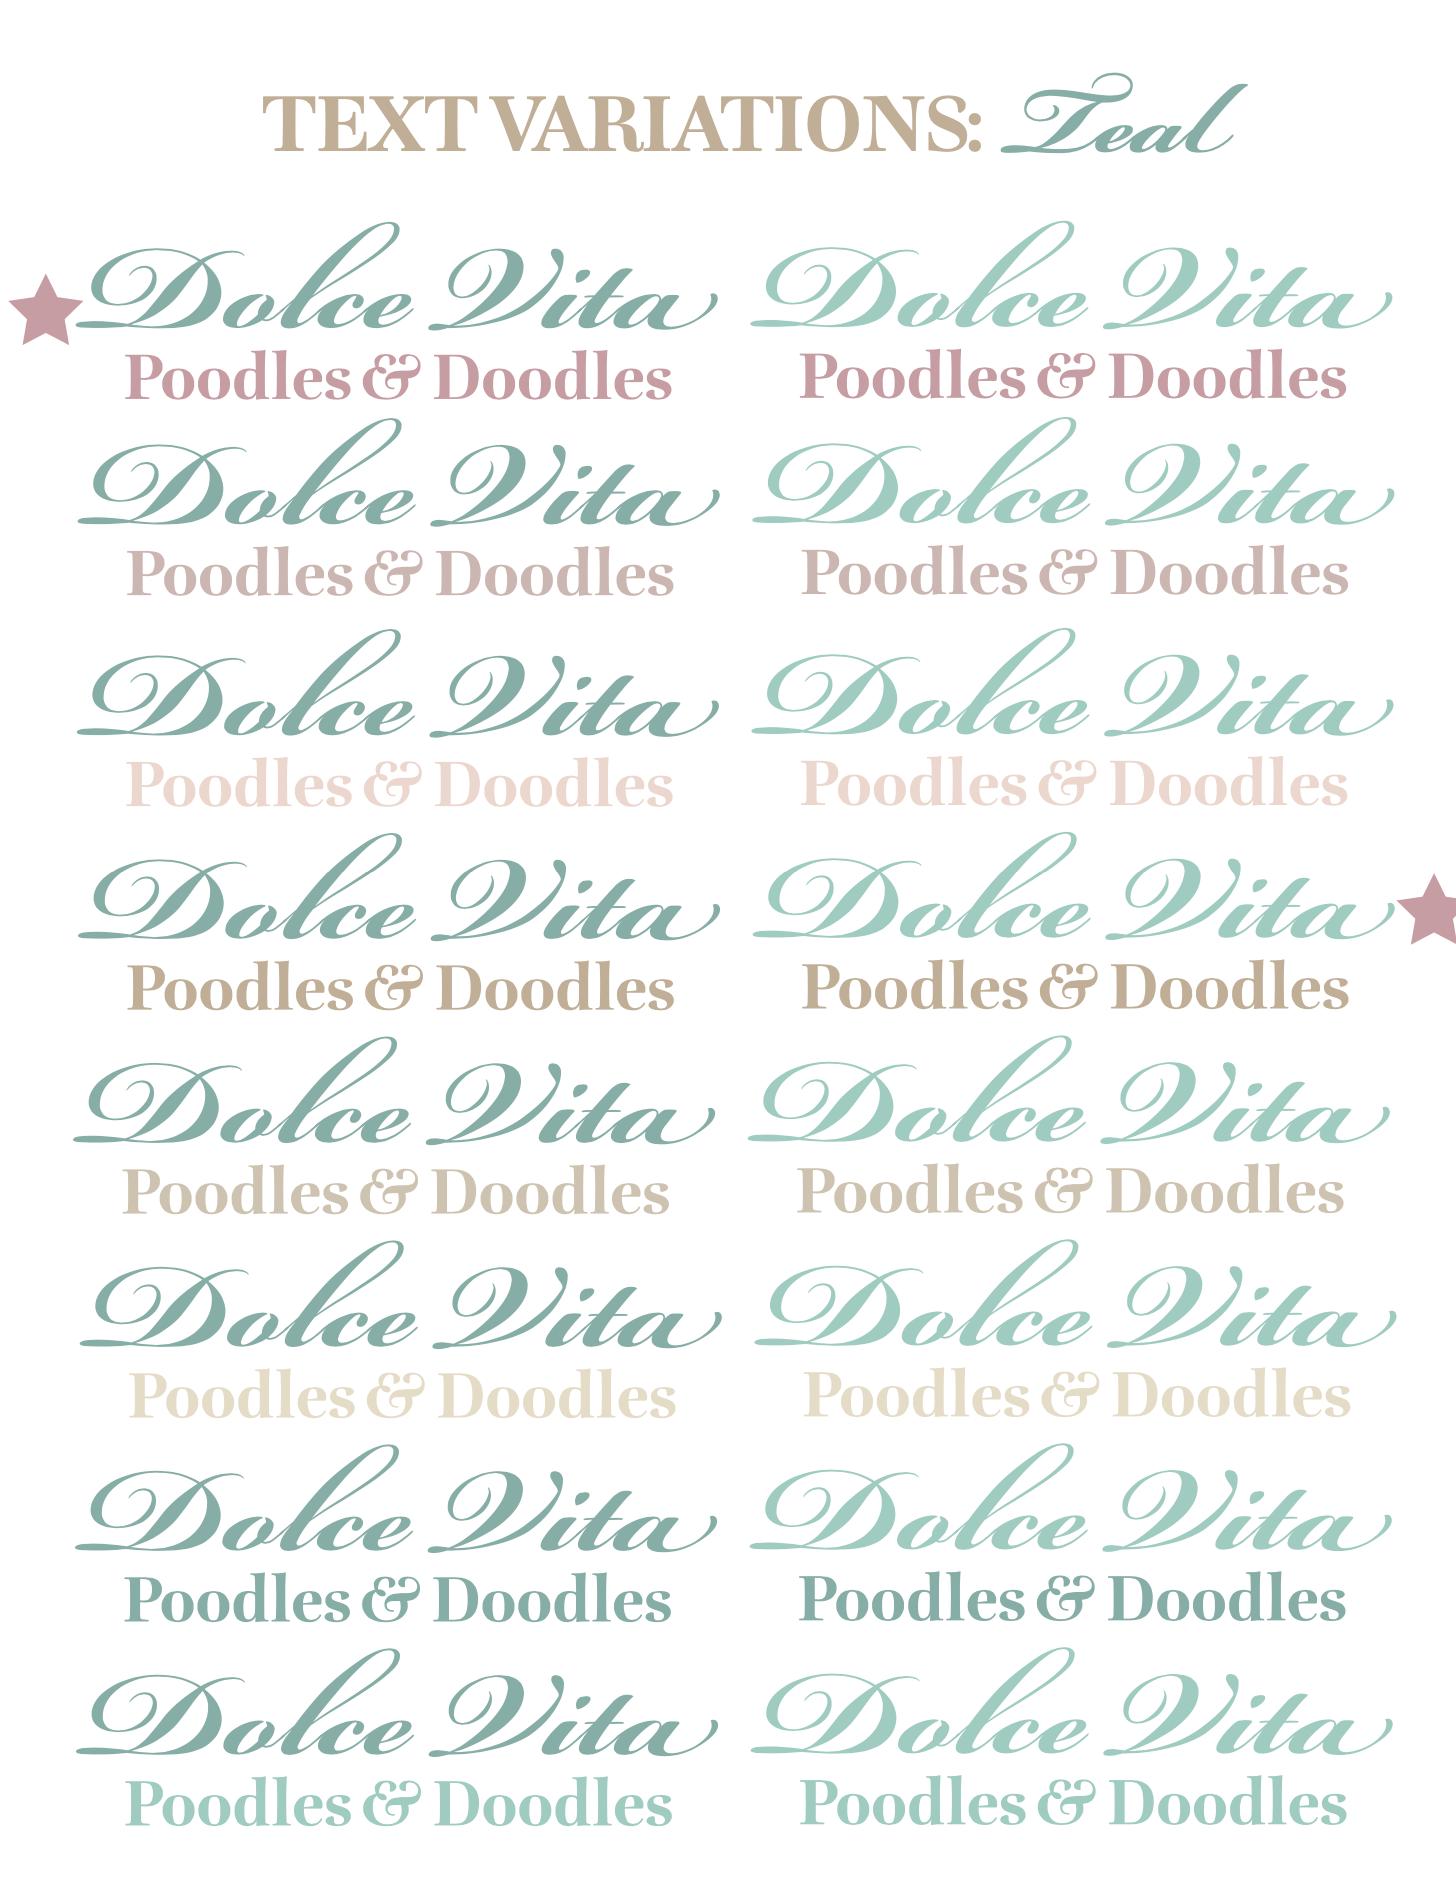 Dolce Vita Text Variations 2